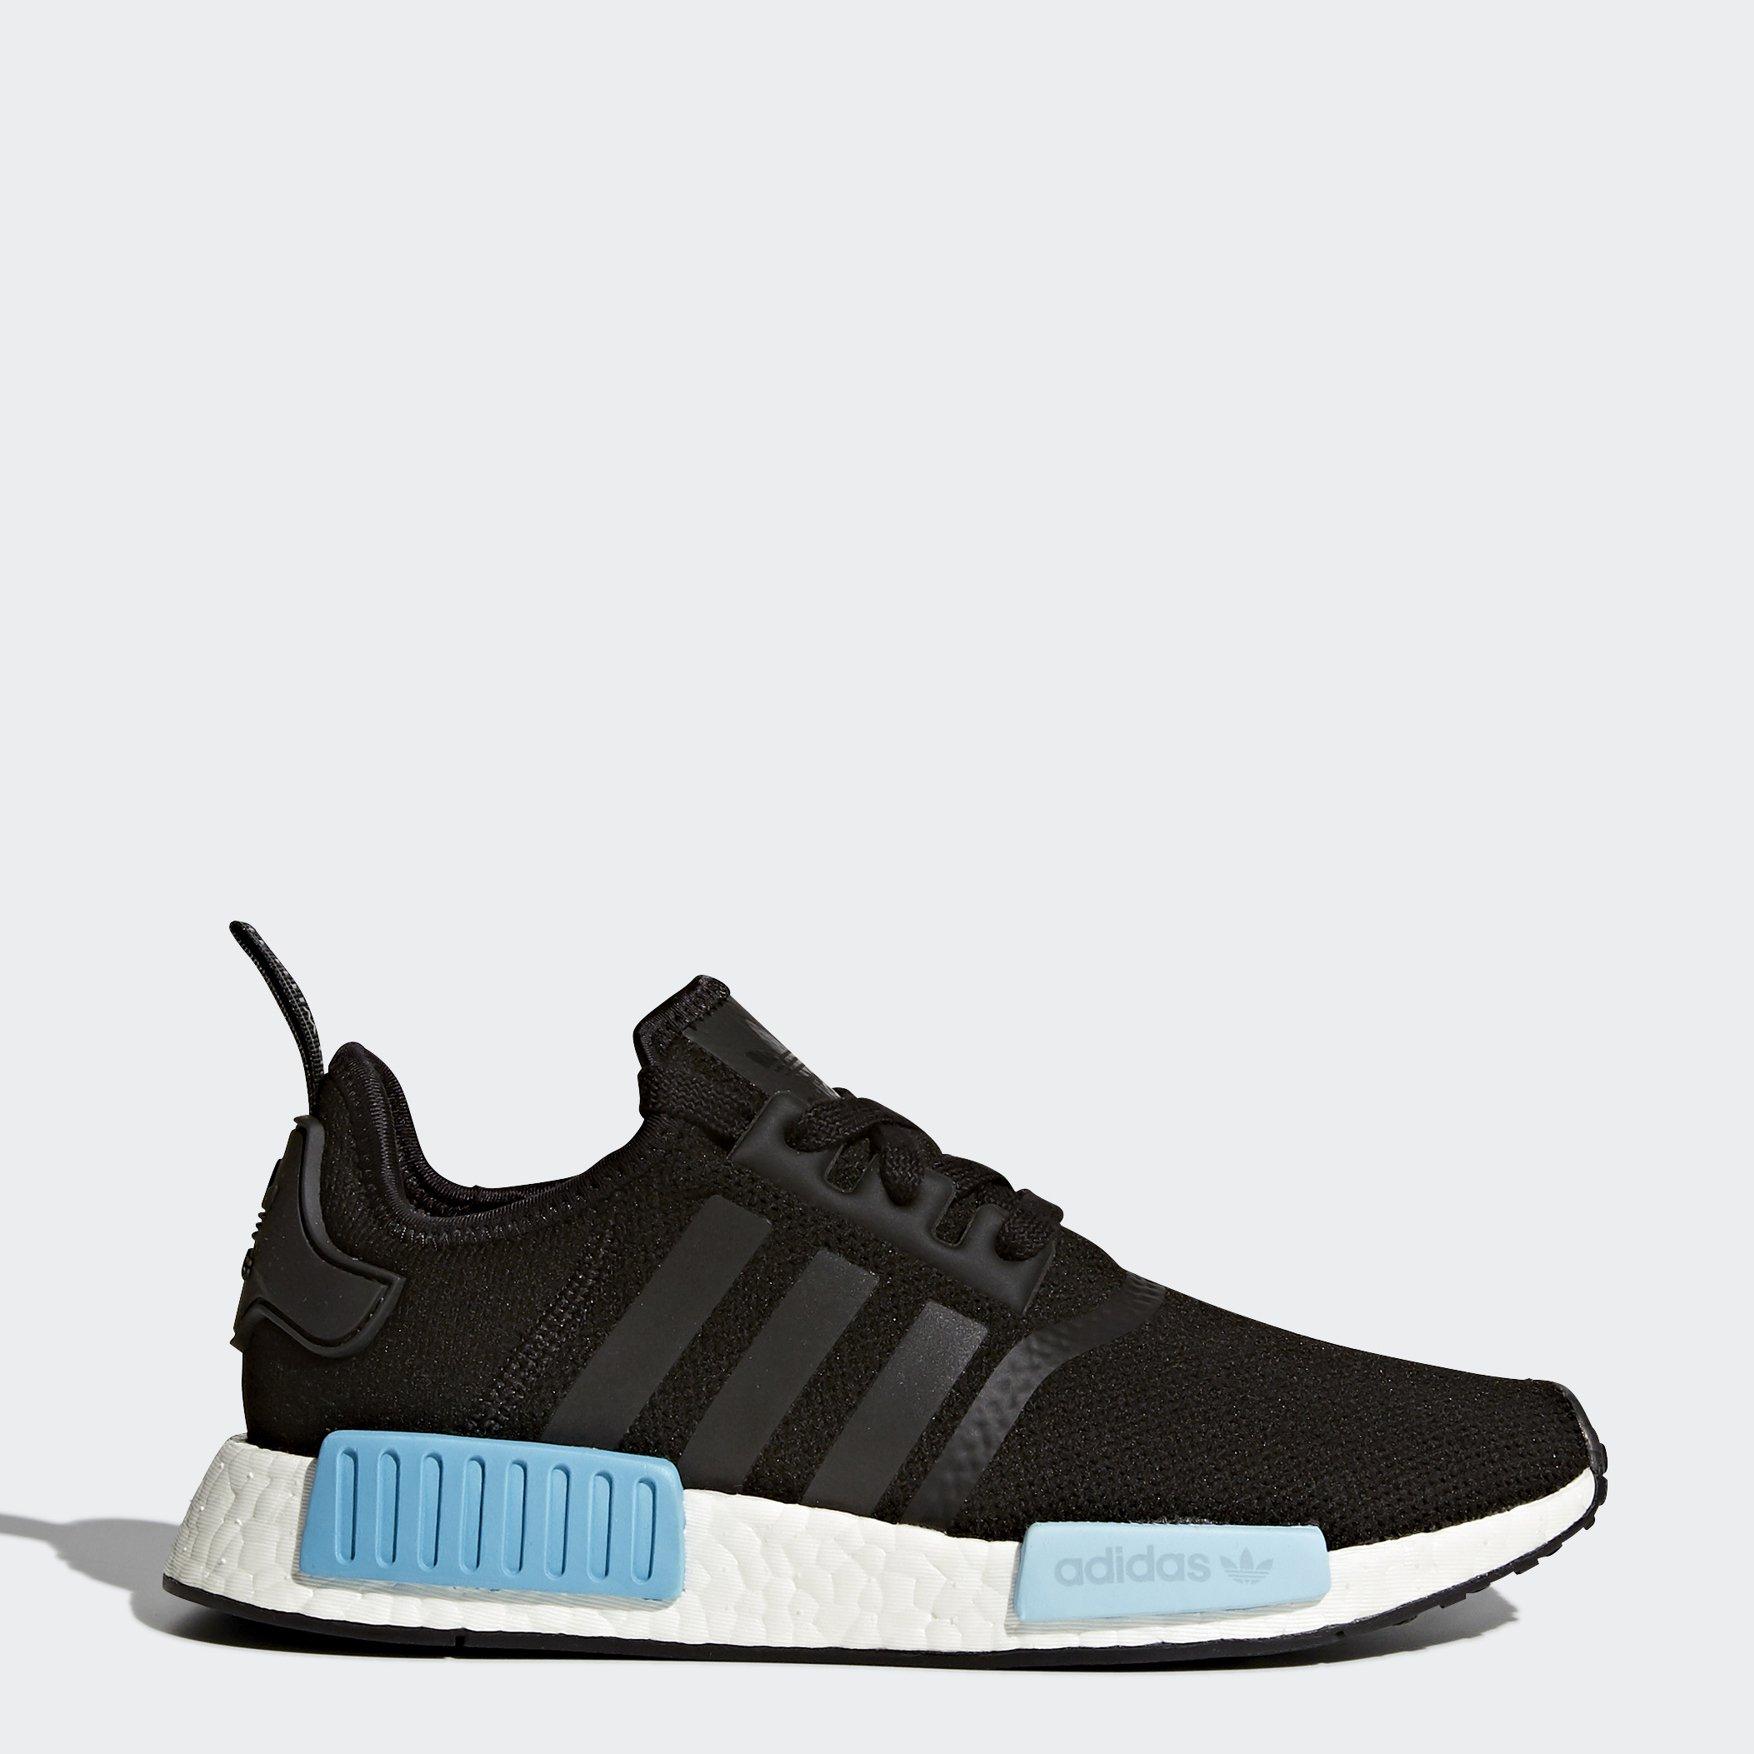 Кроссовки Adidas Og Nmd R1, core black/core black/icey blue, 37.5 RU фото